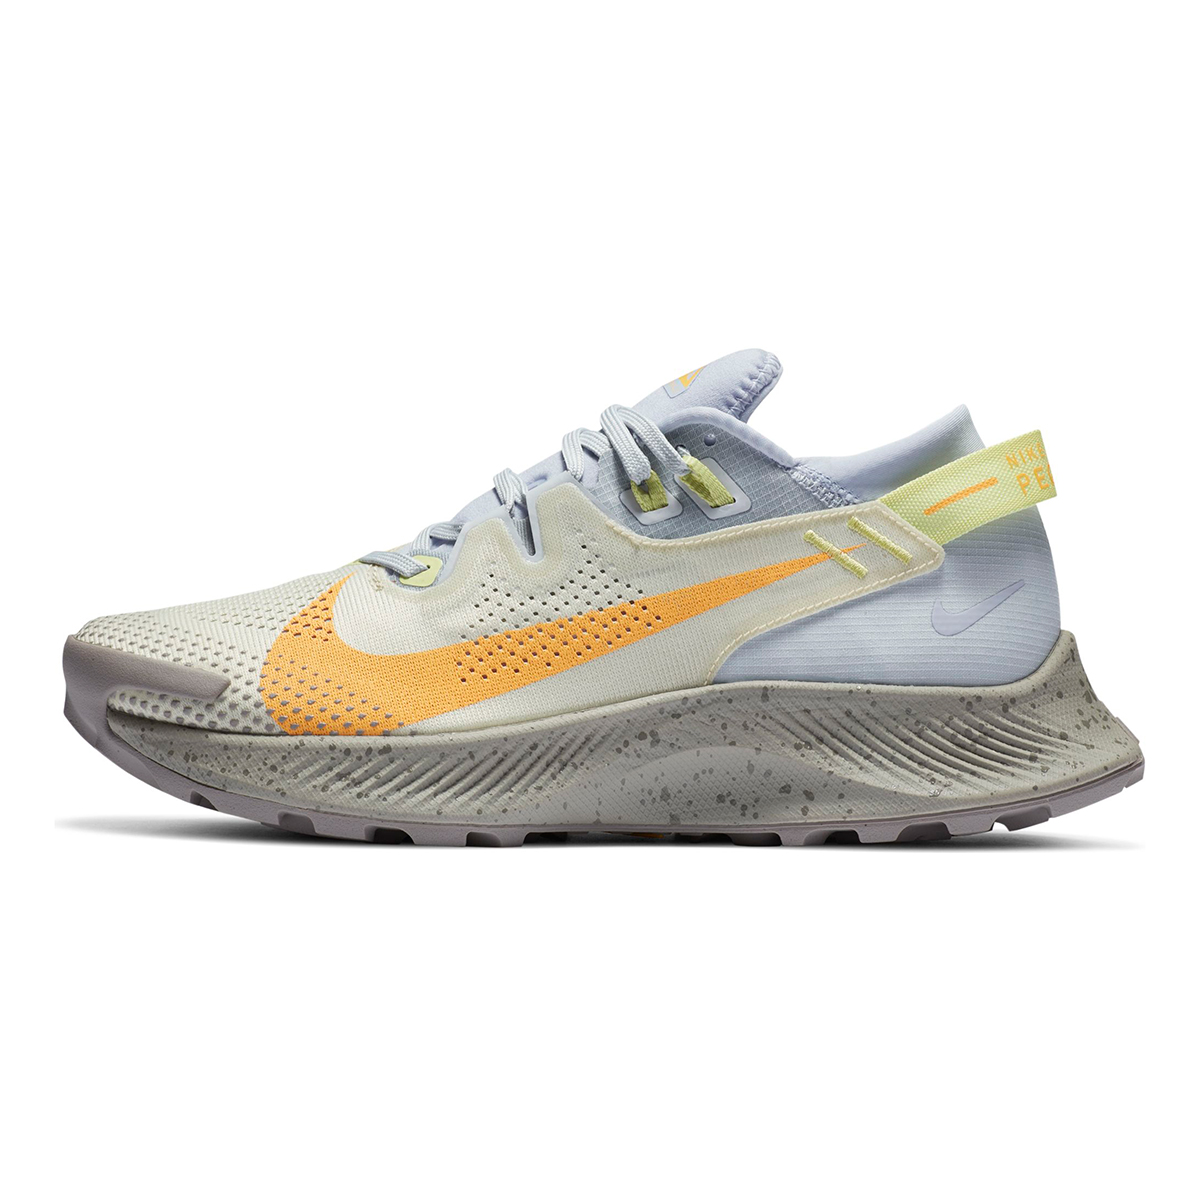 Women's Nike Pegasus Trail 2 Trail Running Shoe - Color: Pure Platinum/Fossil/Limelight/Laser Orange - Size: 5 - Width: Regular, Pure Platinum/Fossil/Limelight/Laser Orange, large, image 3